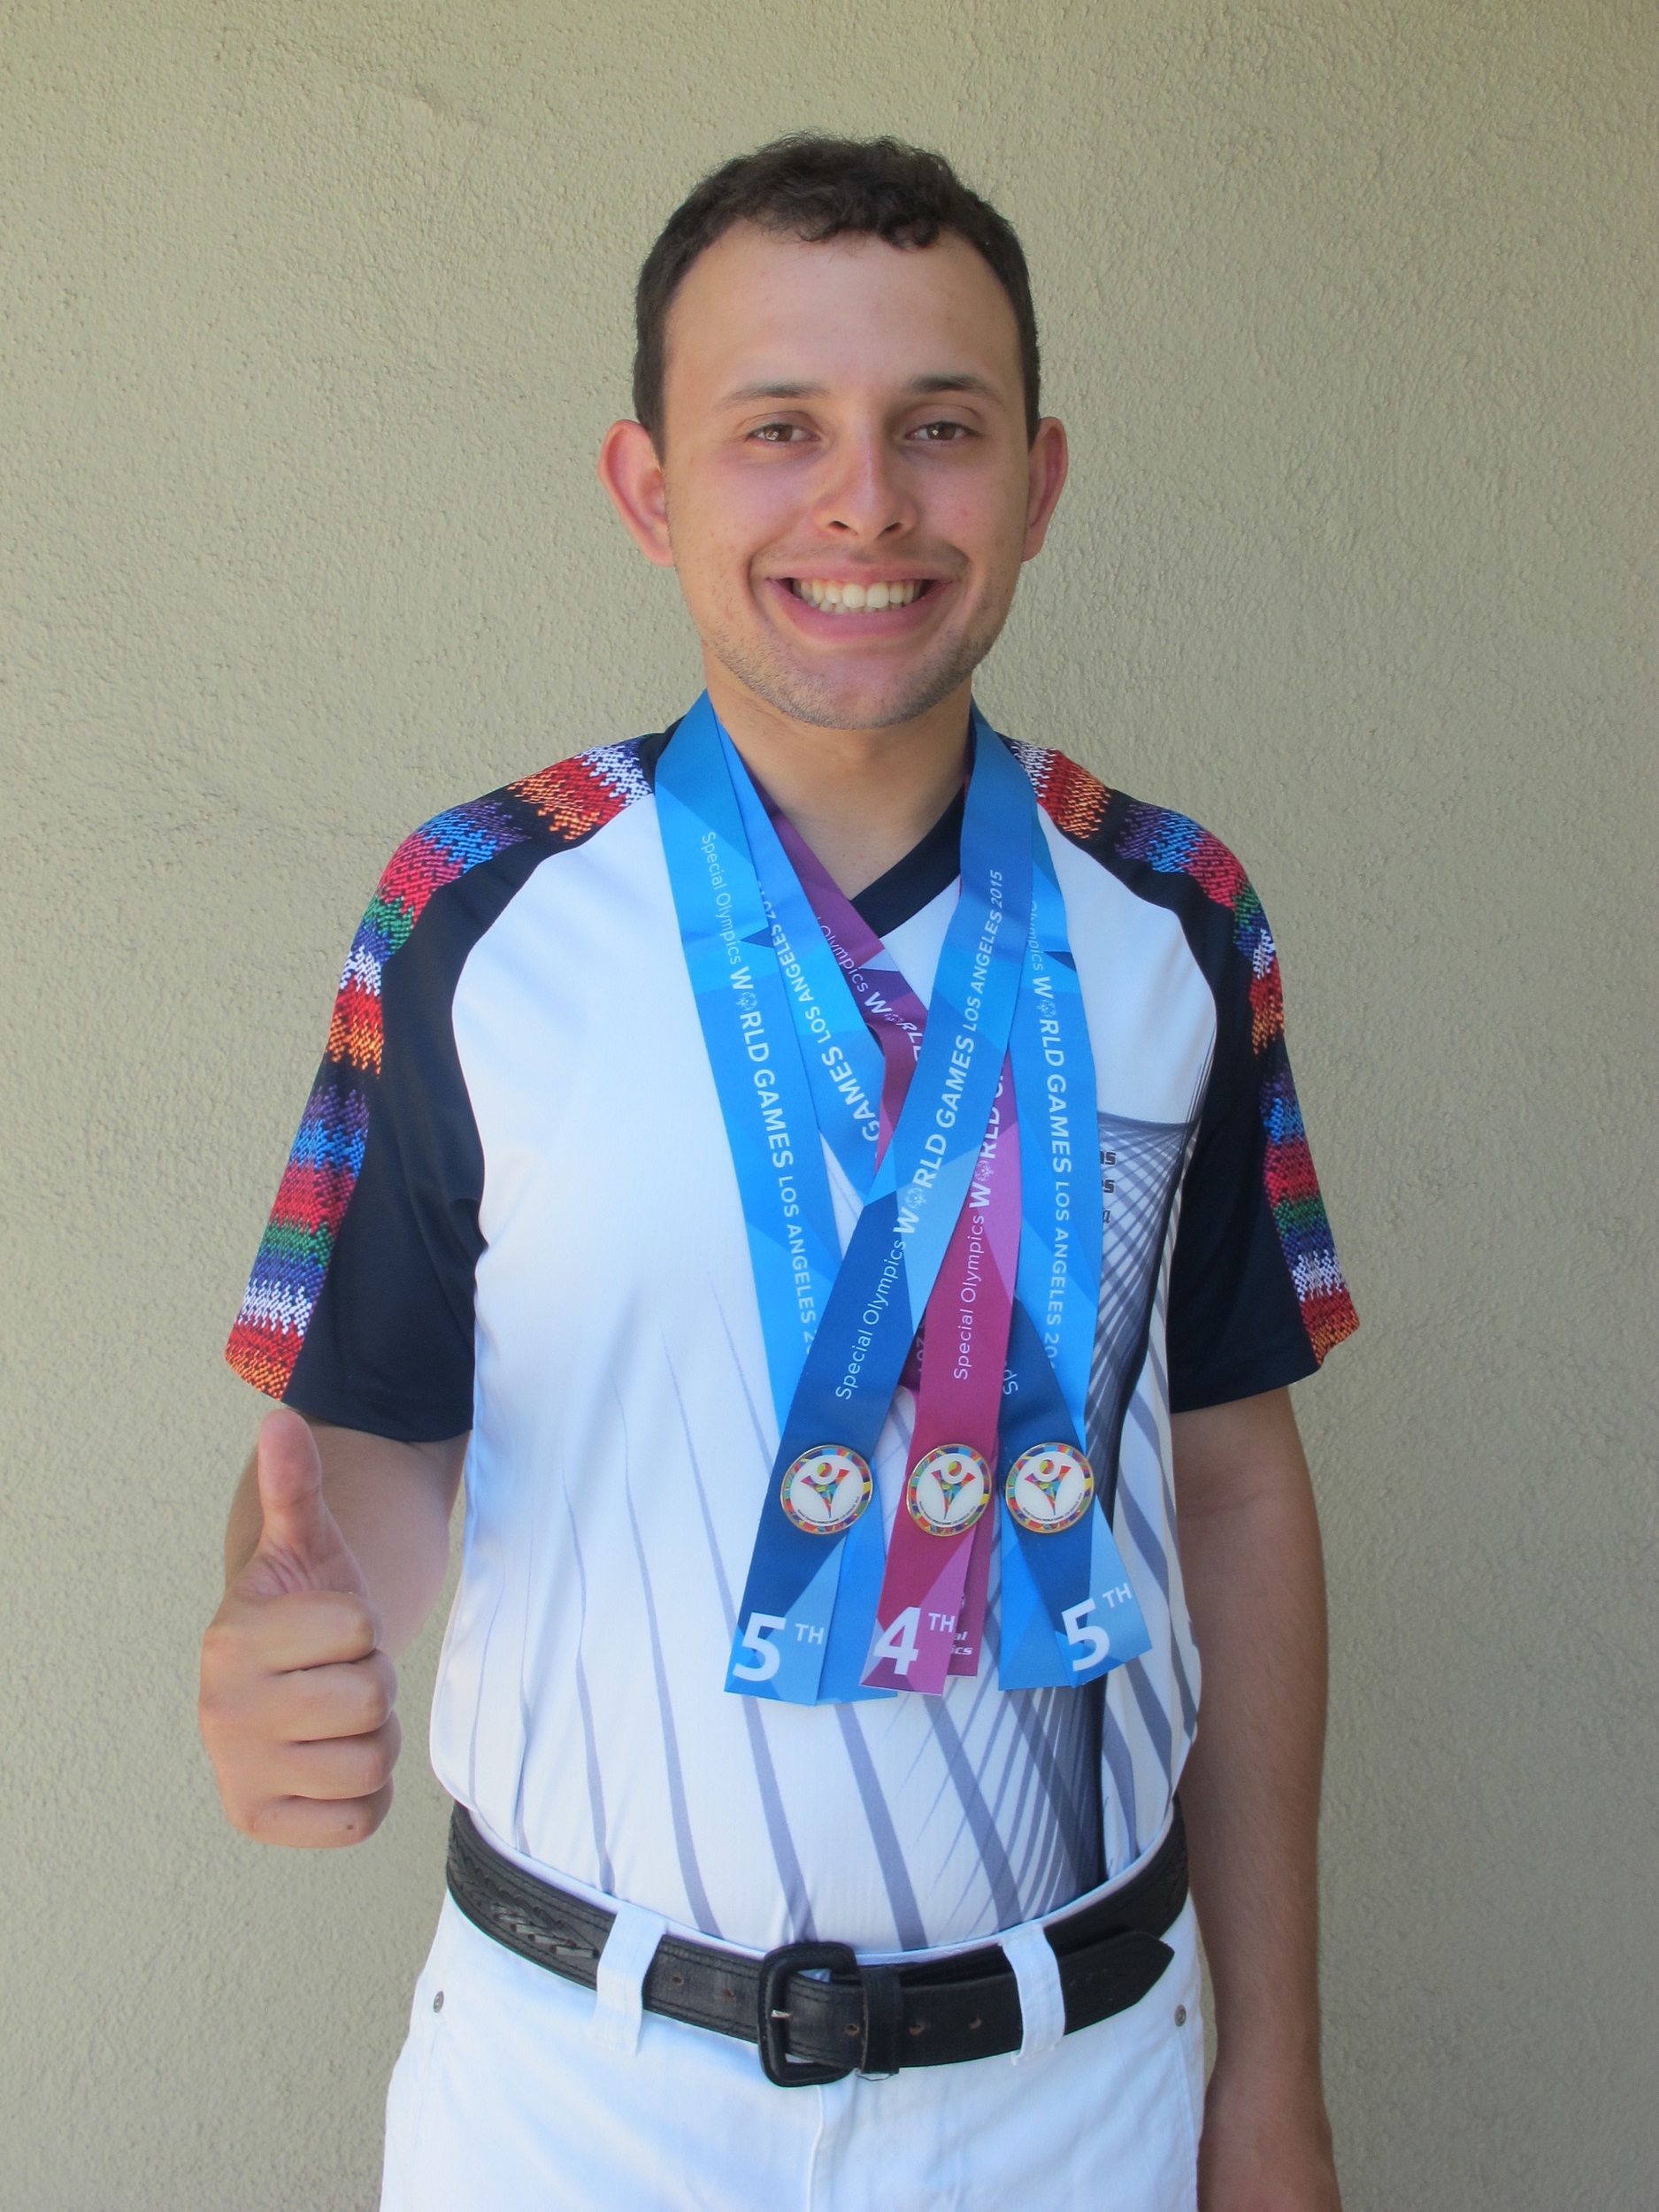 Ricardo Sousa Equitación No obtuvo medalla, 4to Working Trail 5to Dressage y English Equitation.JPG